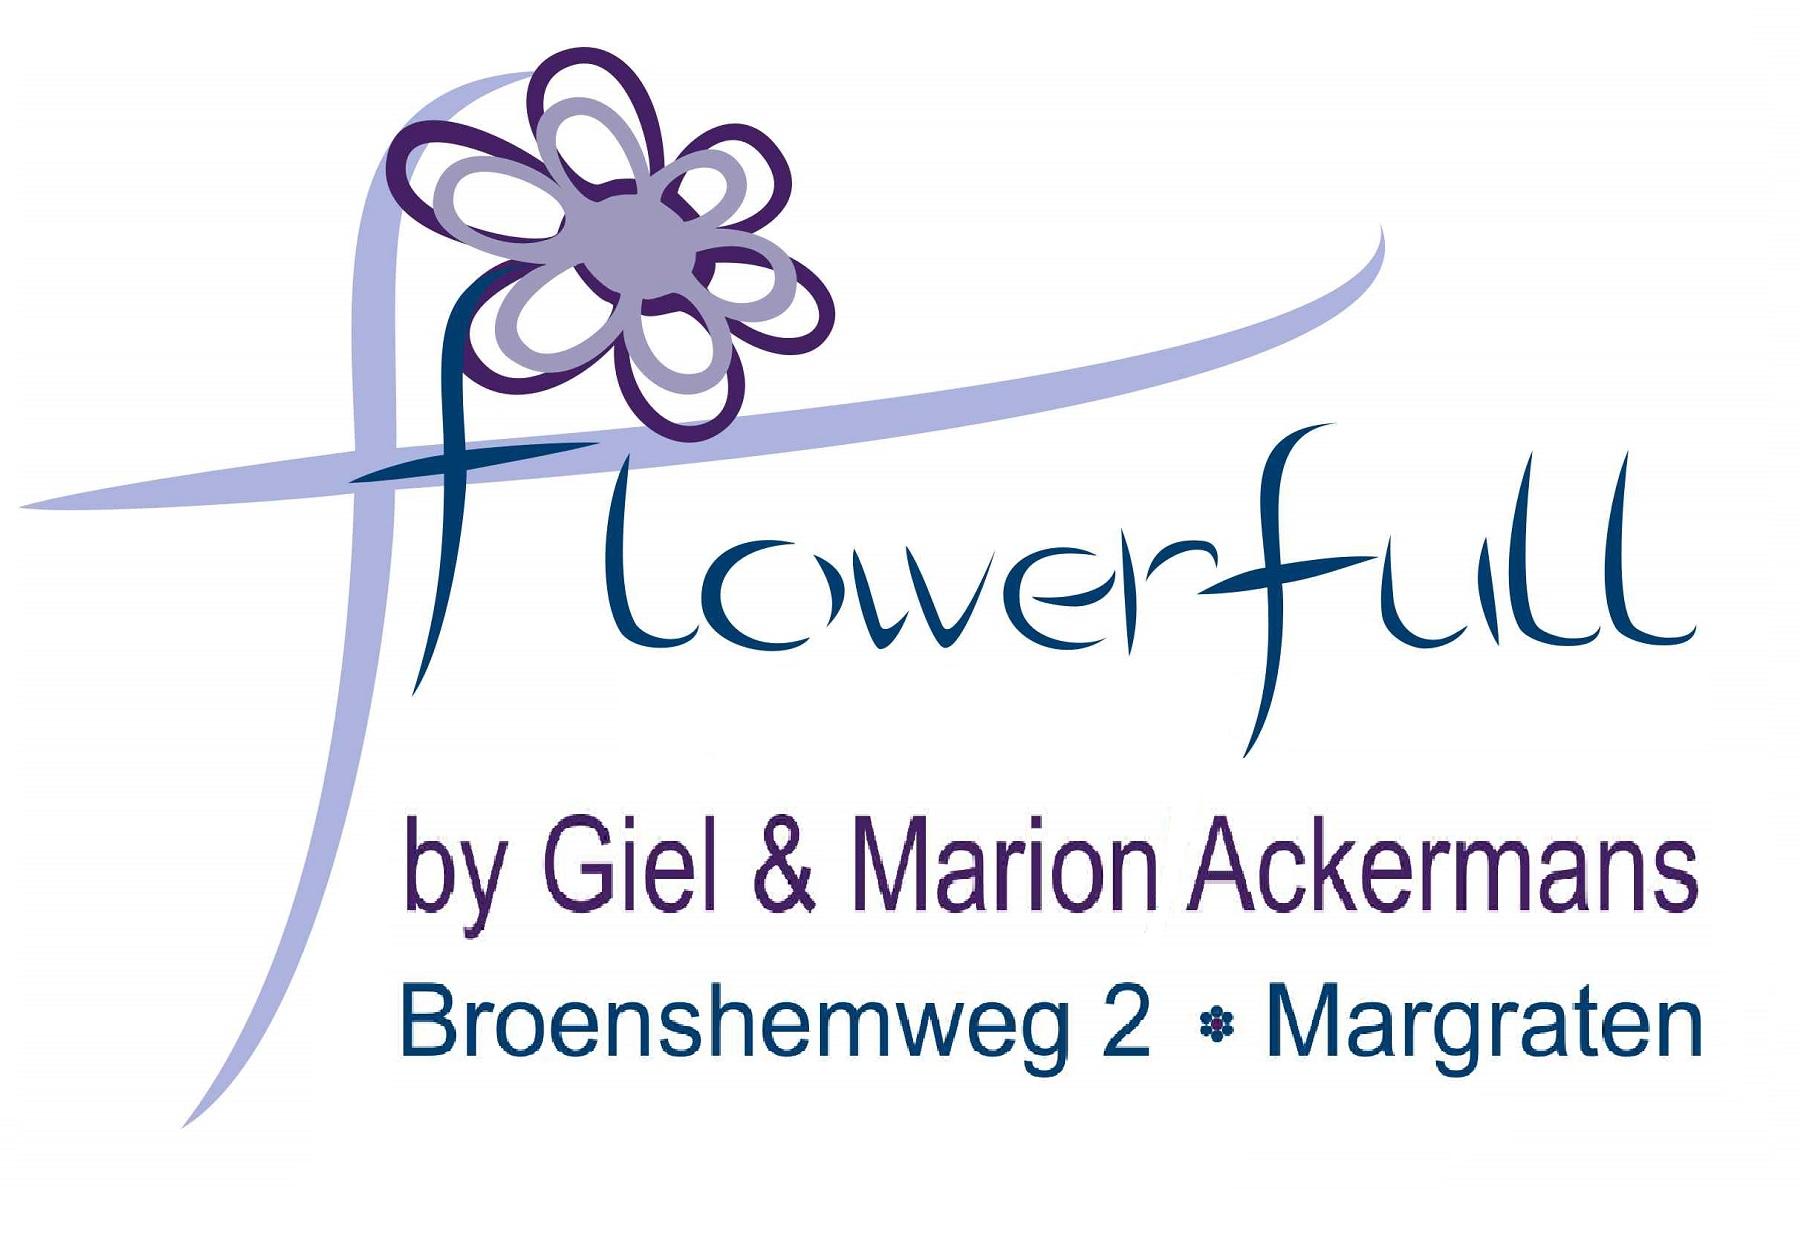 Flowerfull_180x125